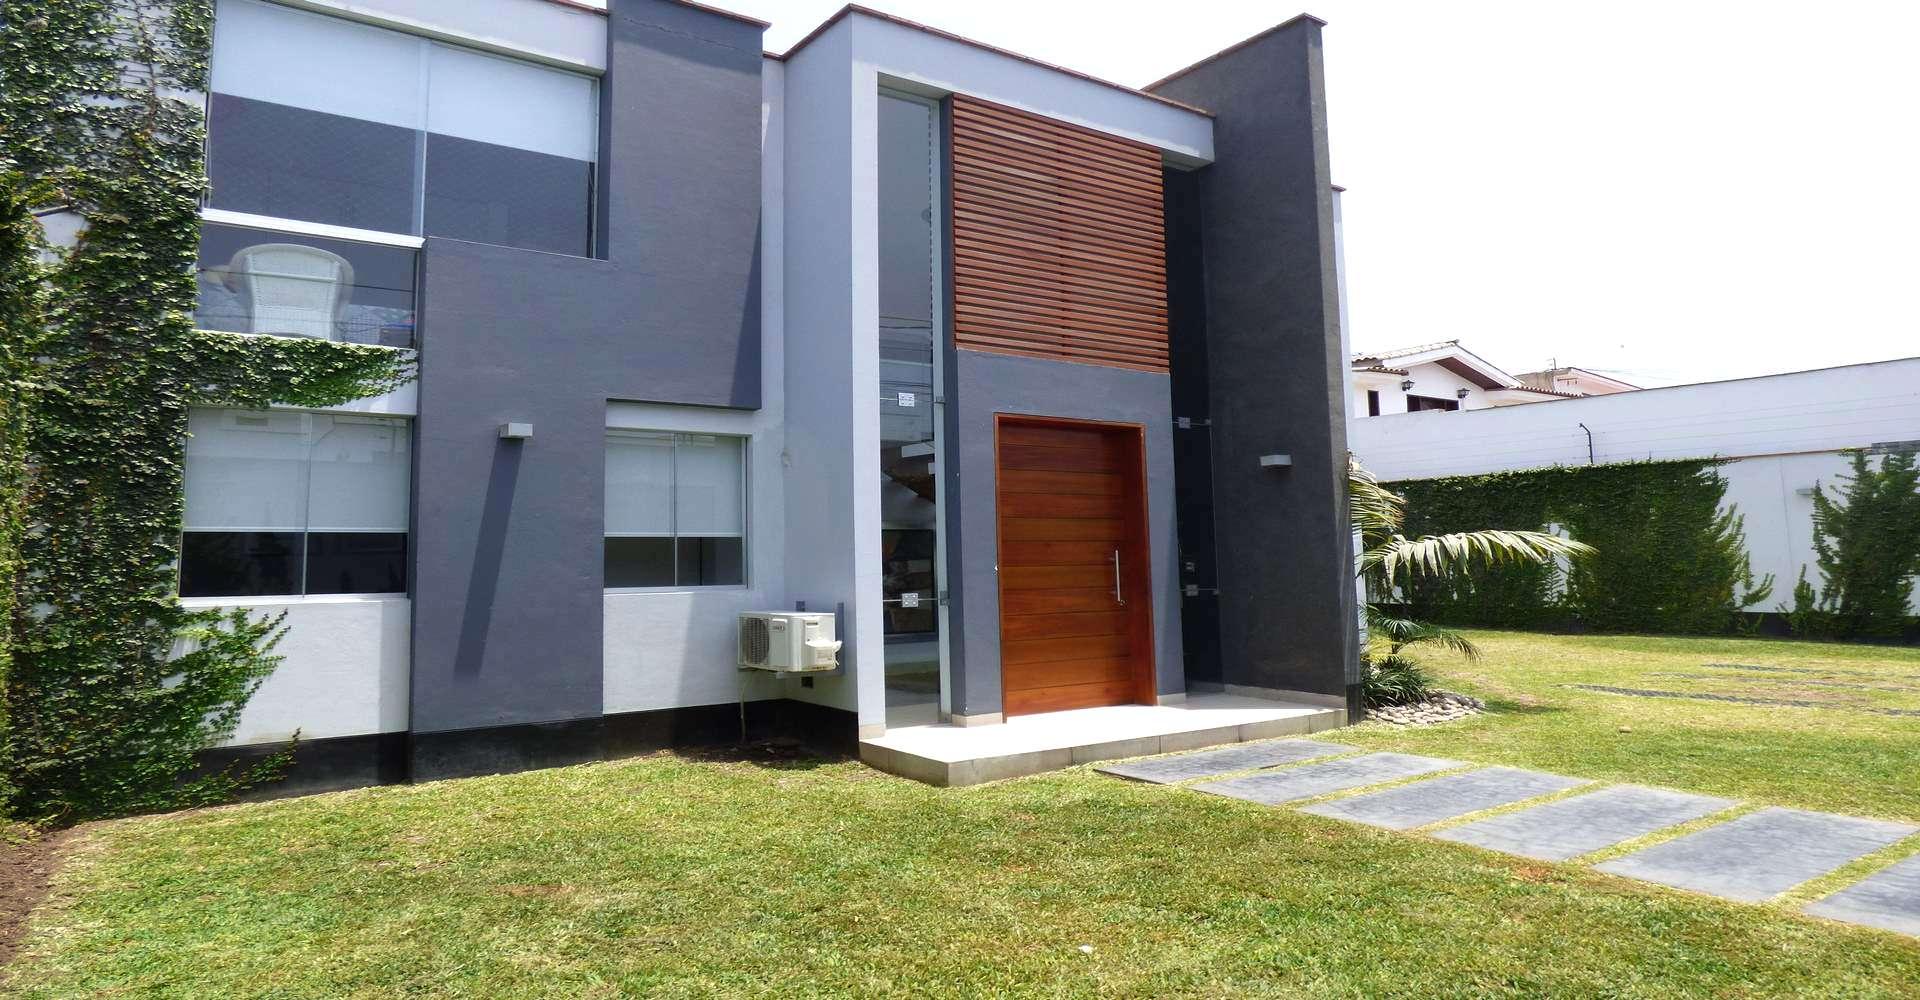 Moderna y exclusiva arquitectura